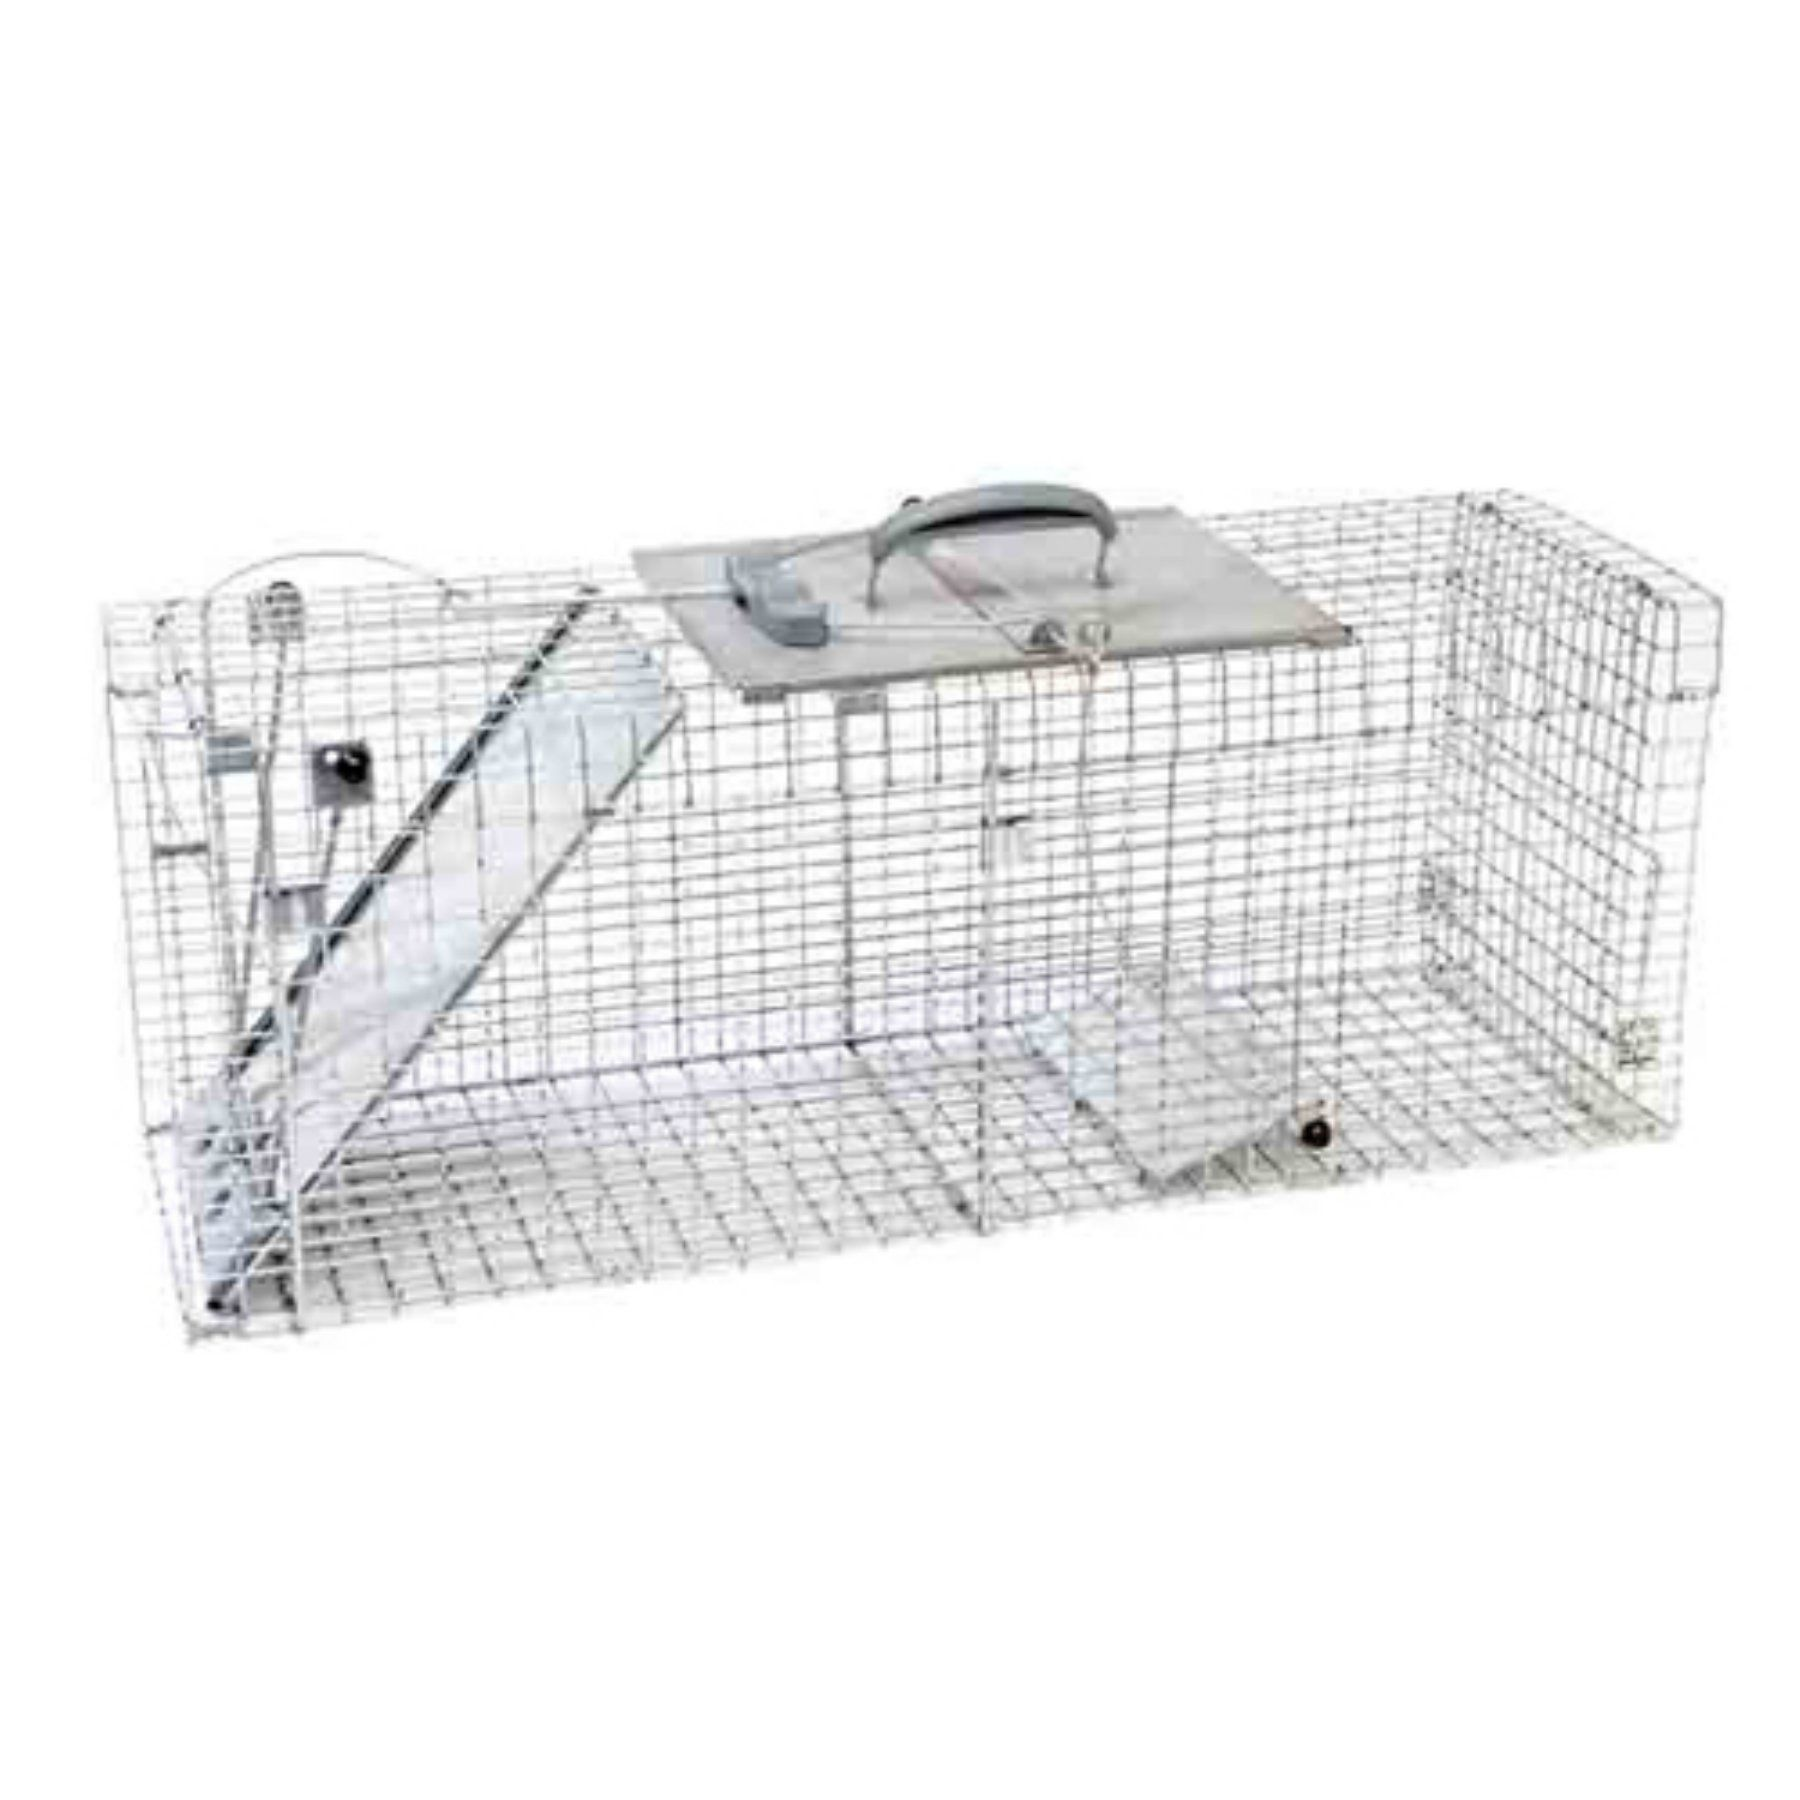 Havahart Large Collapsible Easy Set Trap 1092 Pet cage